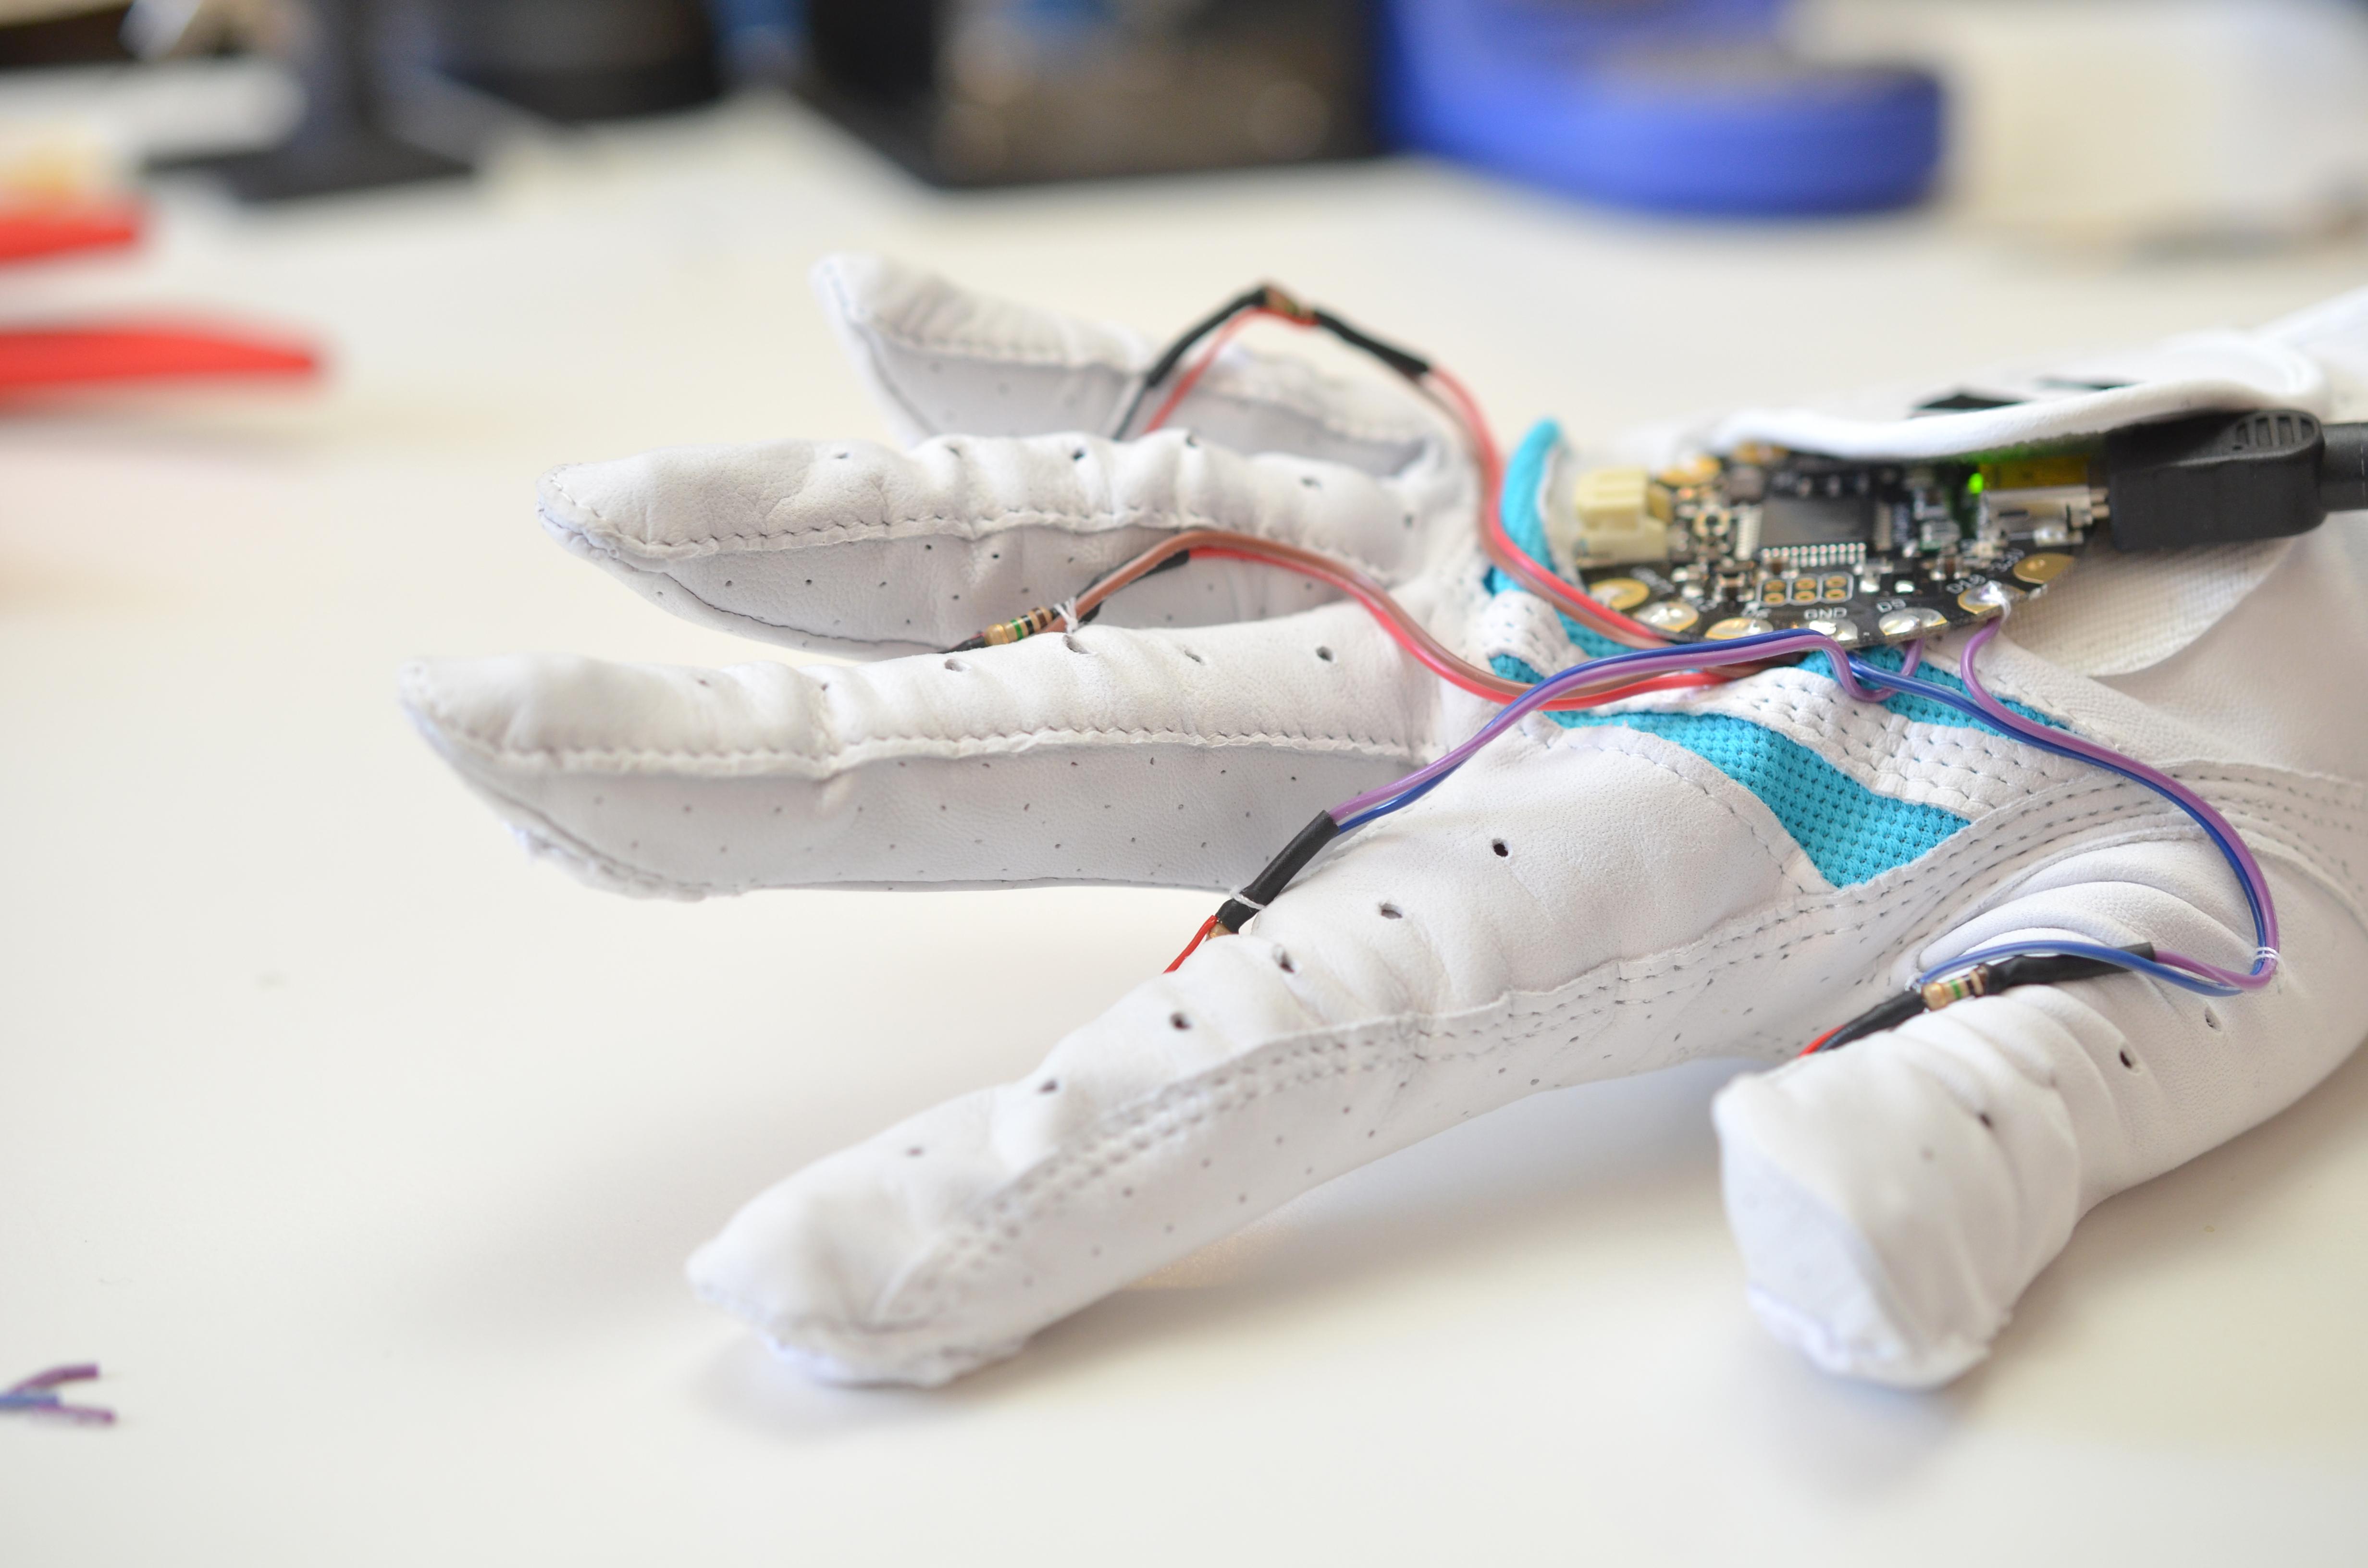 components_force___flex_midi-drum-glove-34.jpg